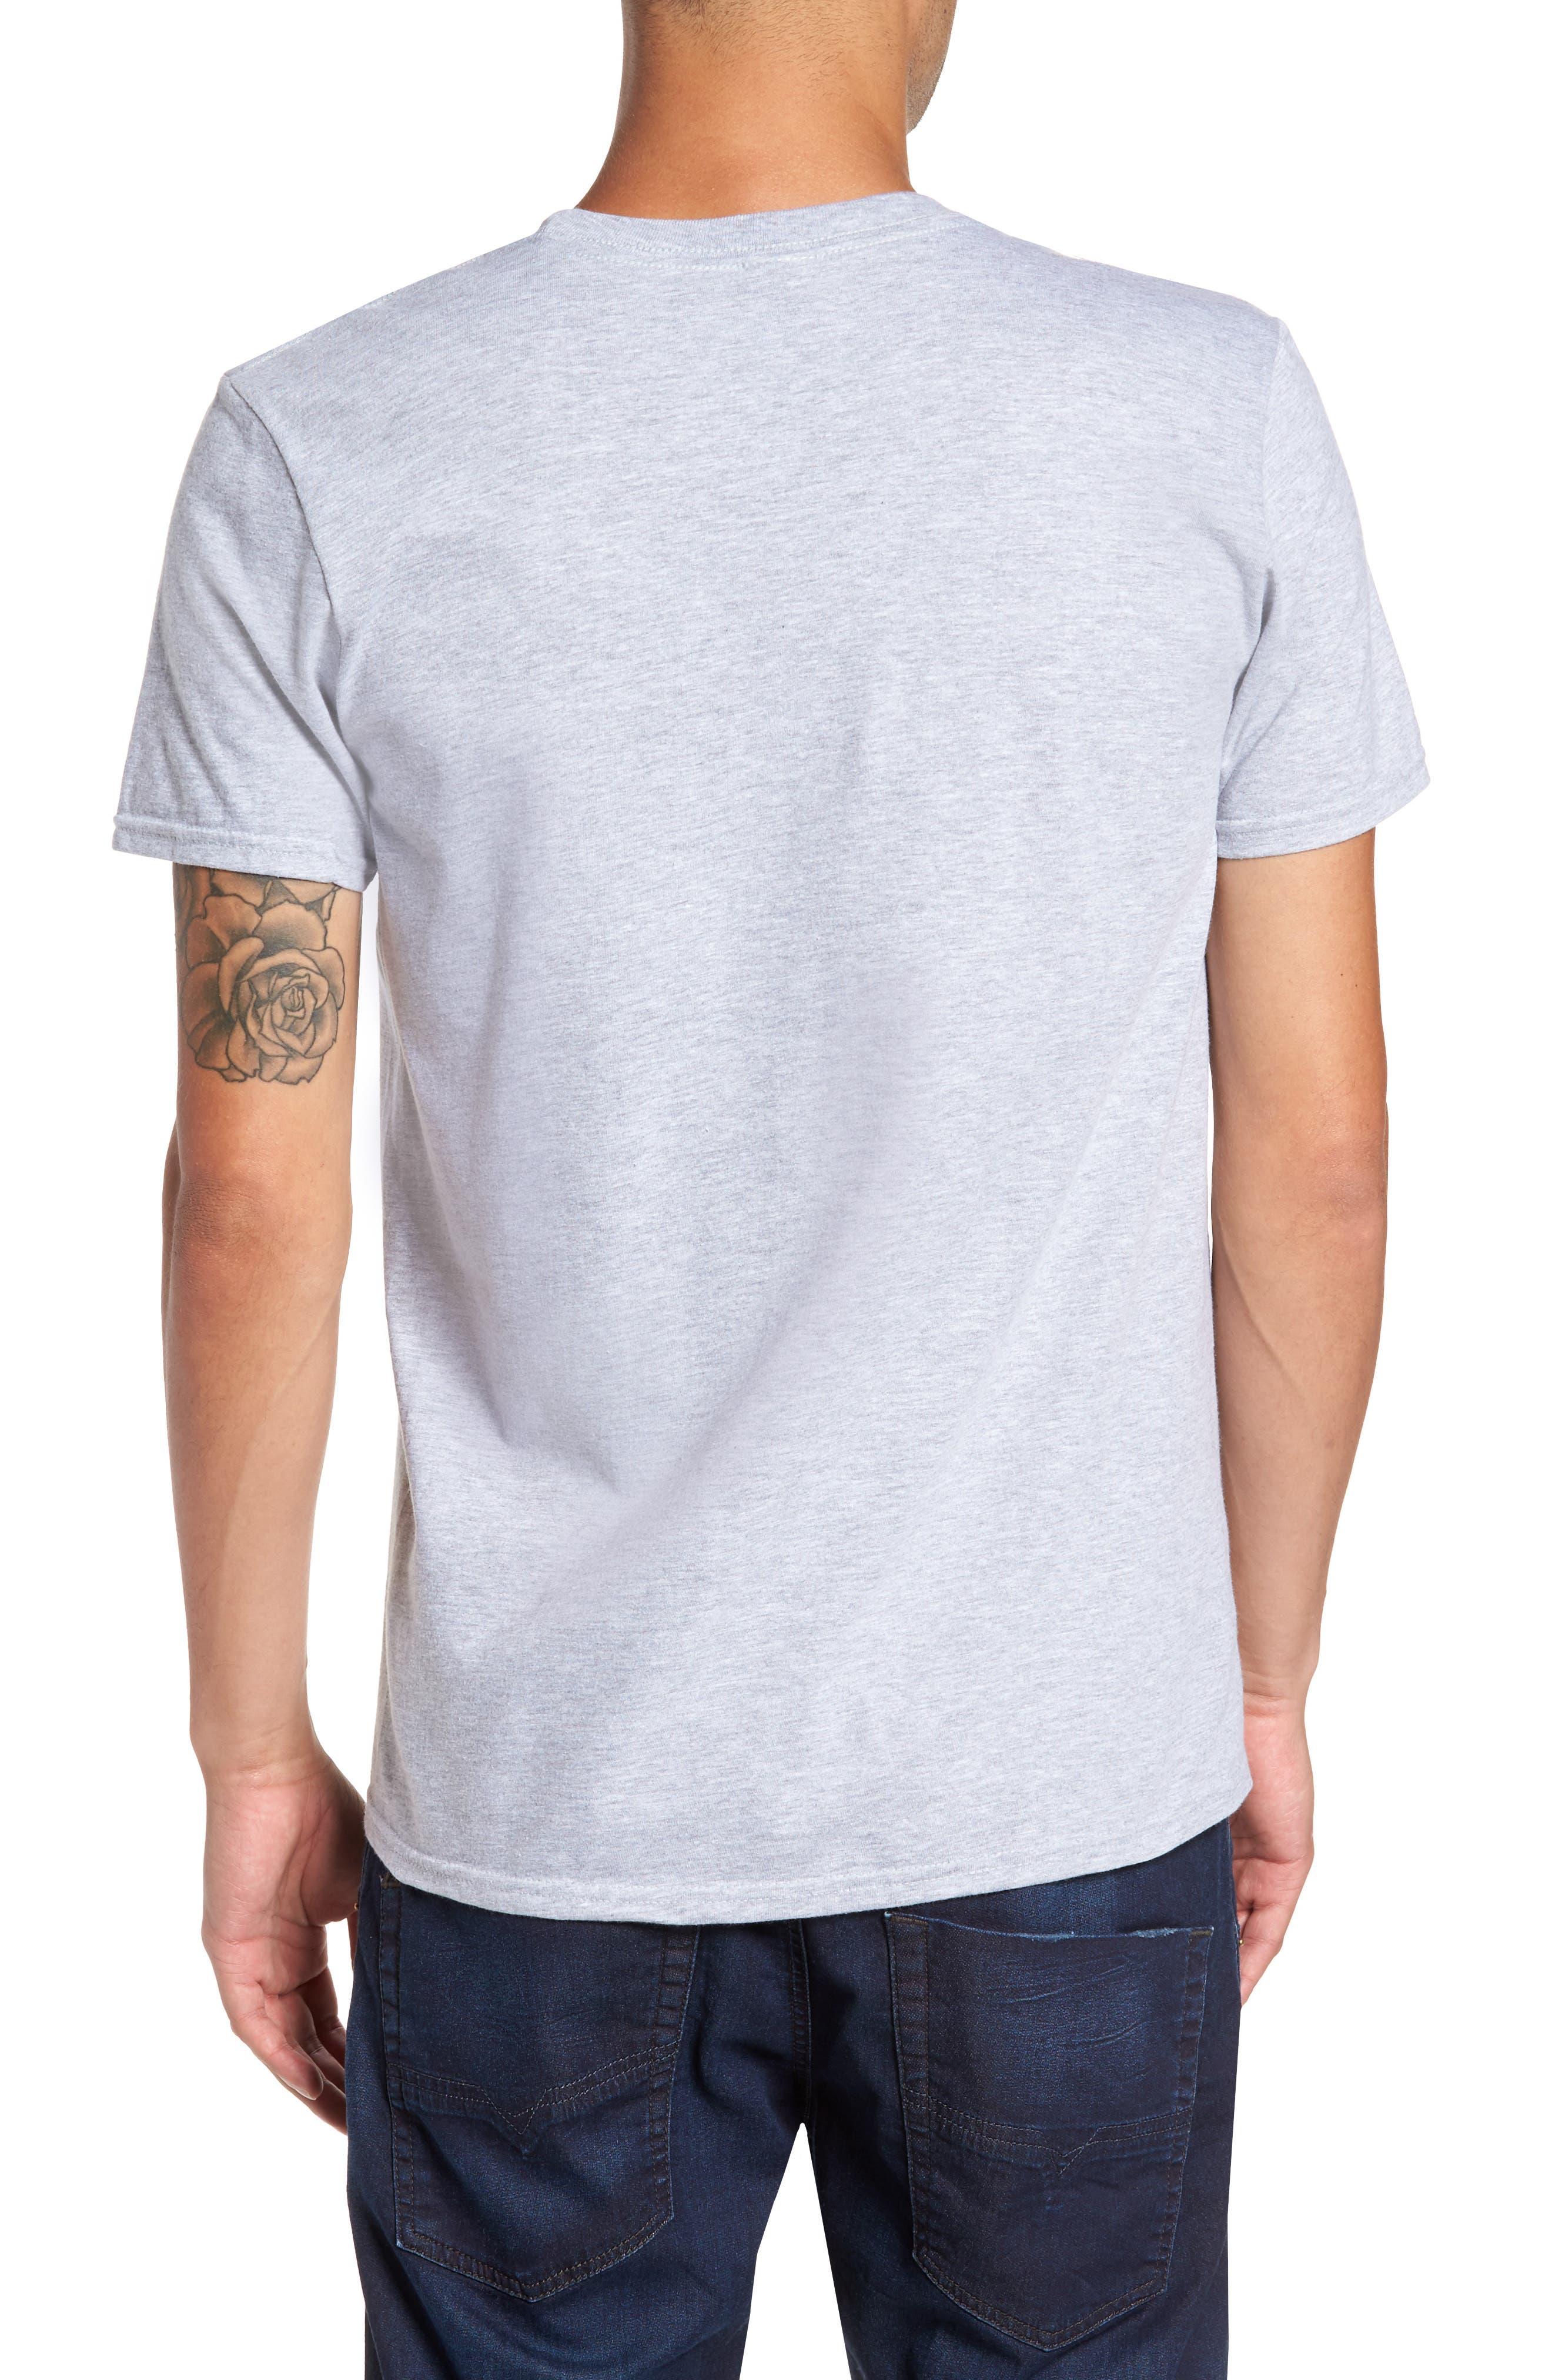 Budweiser<sup>®</sup> T-Shirt,                             Alternate thumbnail 2, color,                             030